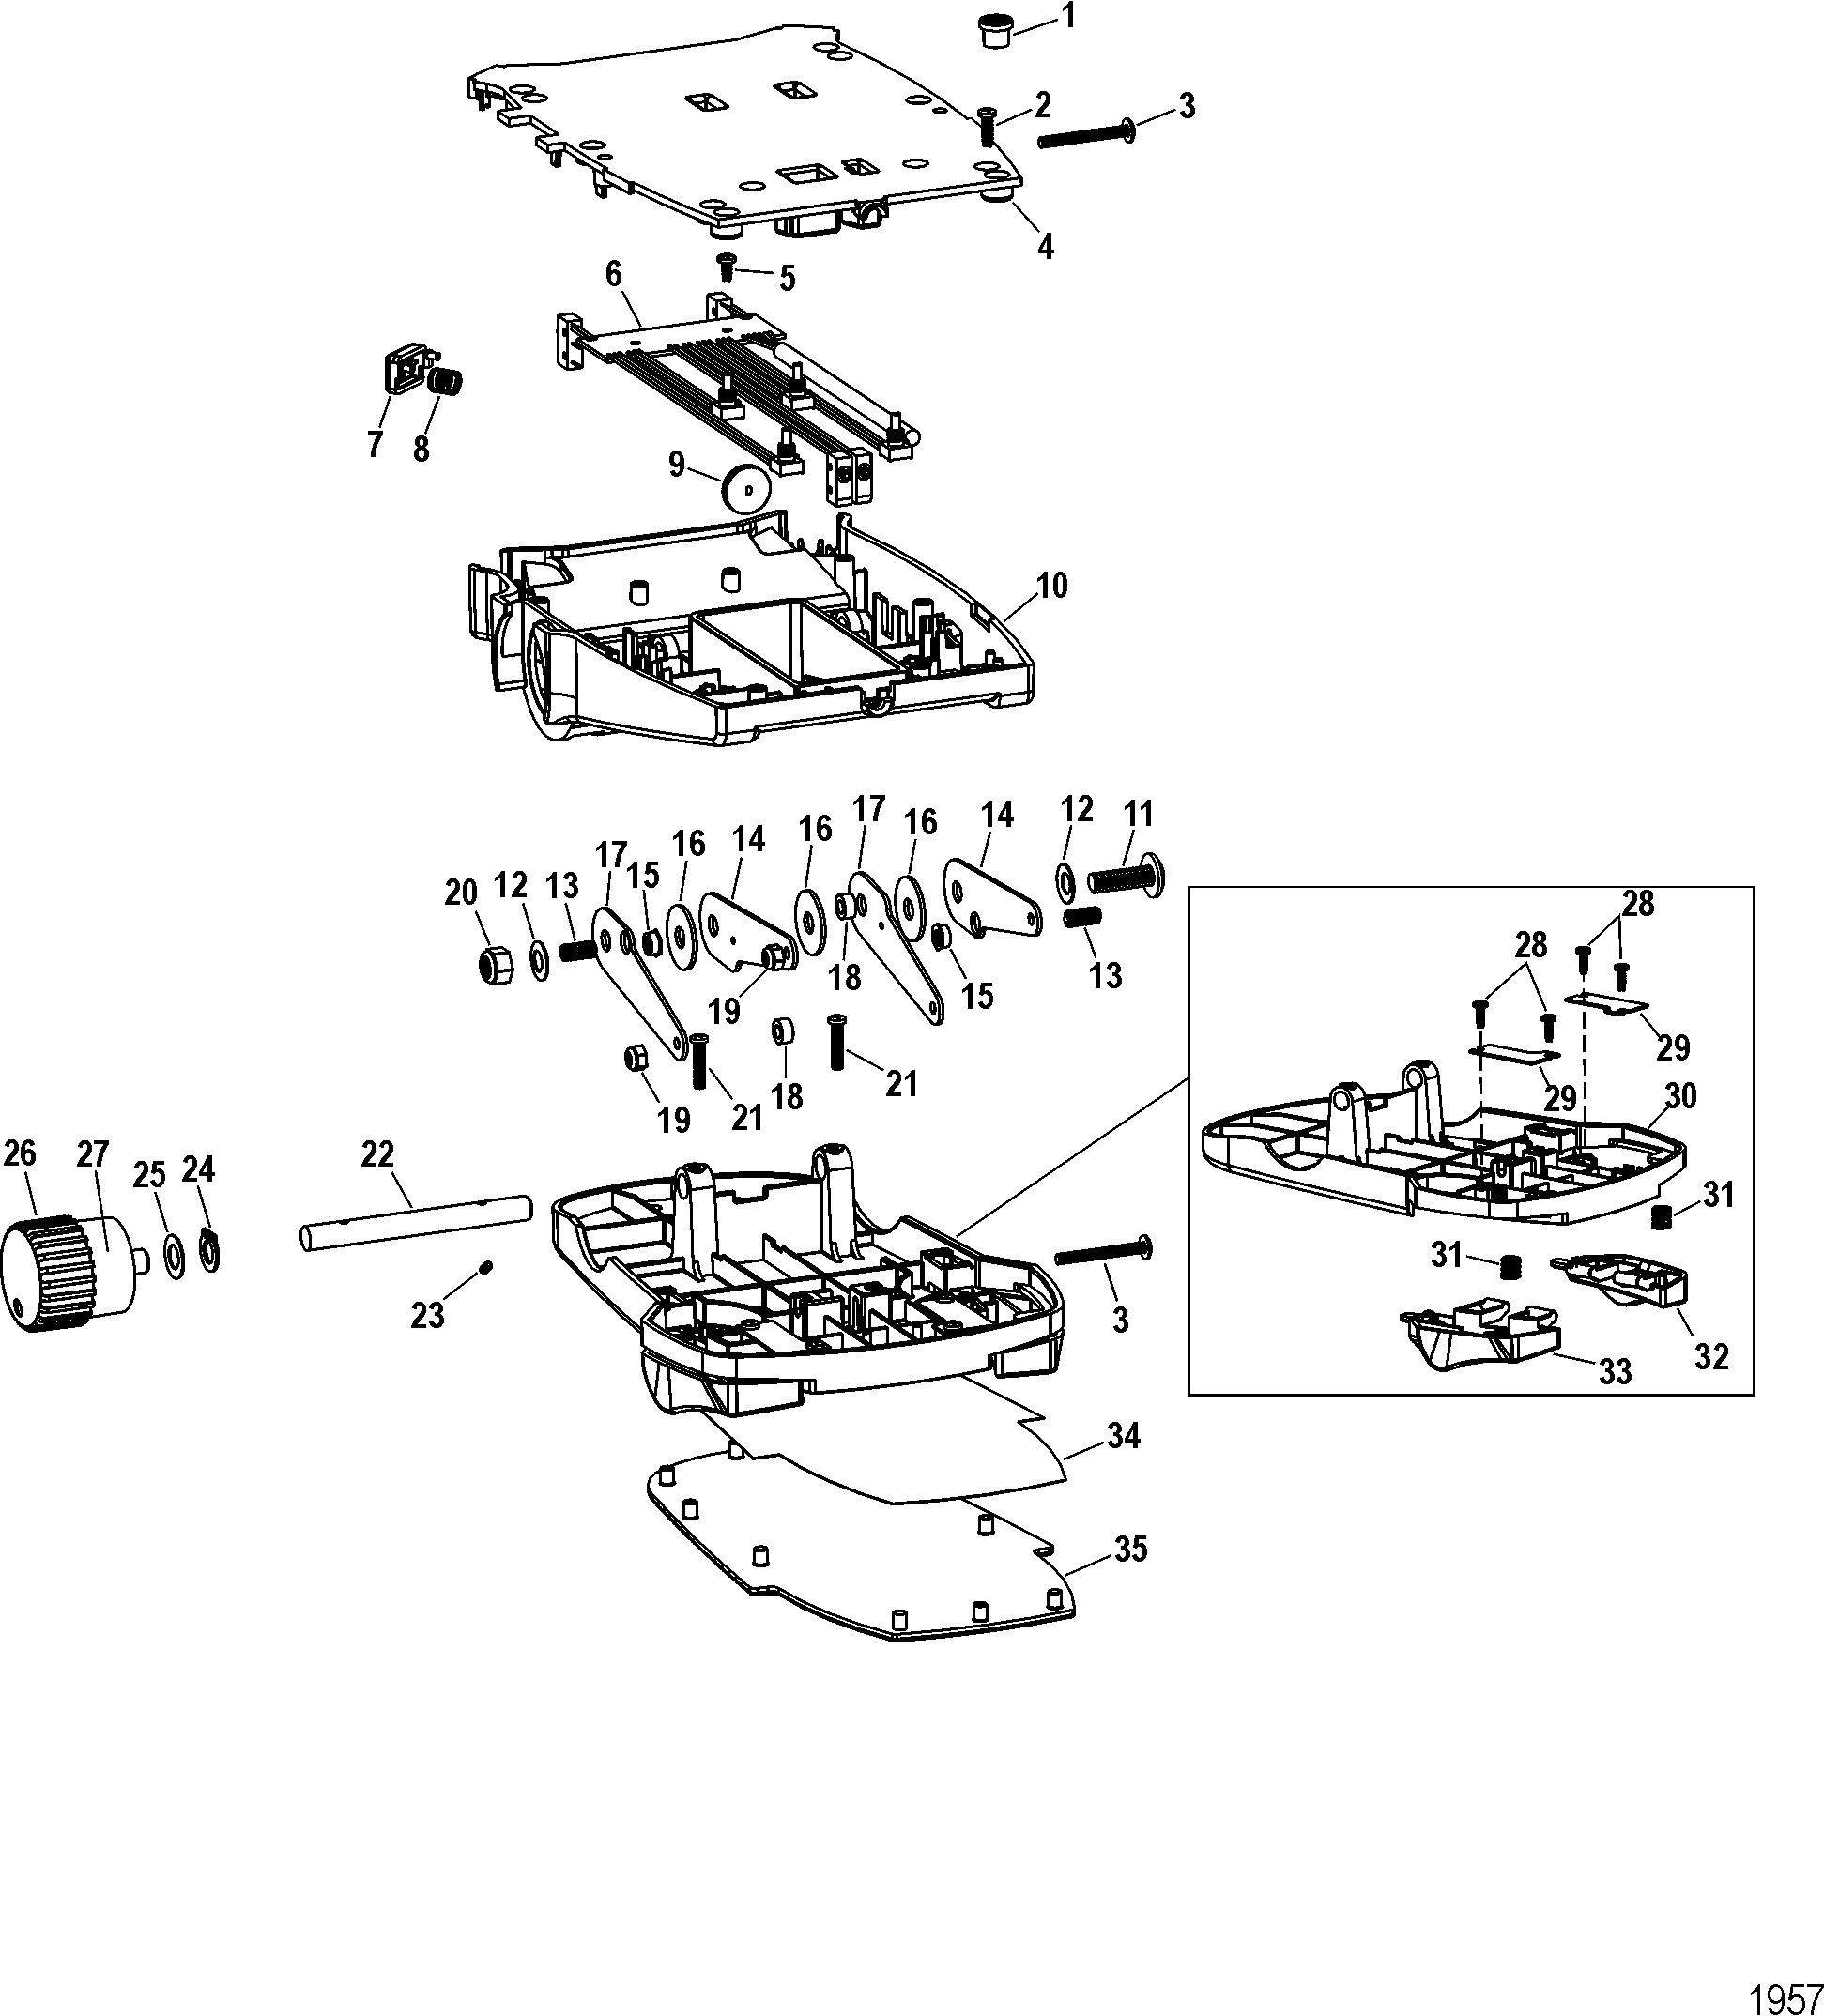 DF_9453] Wiring Diagram Motorguide Foot Pedal Free Download Schematic WiringTrua Over Benkeme Rine Umize Ponge Mohammedshrine Librar Wiring 101